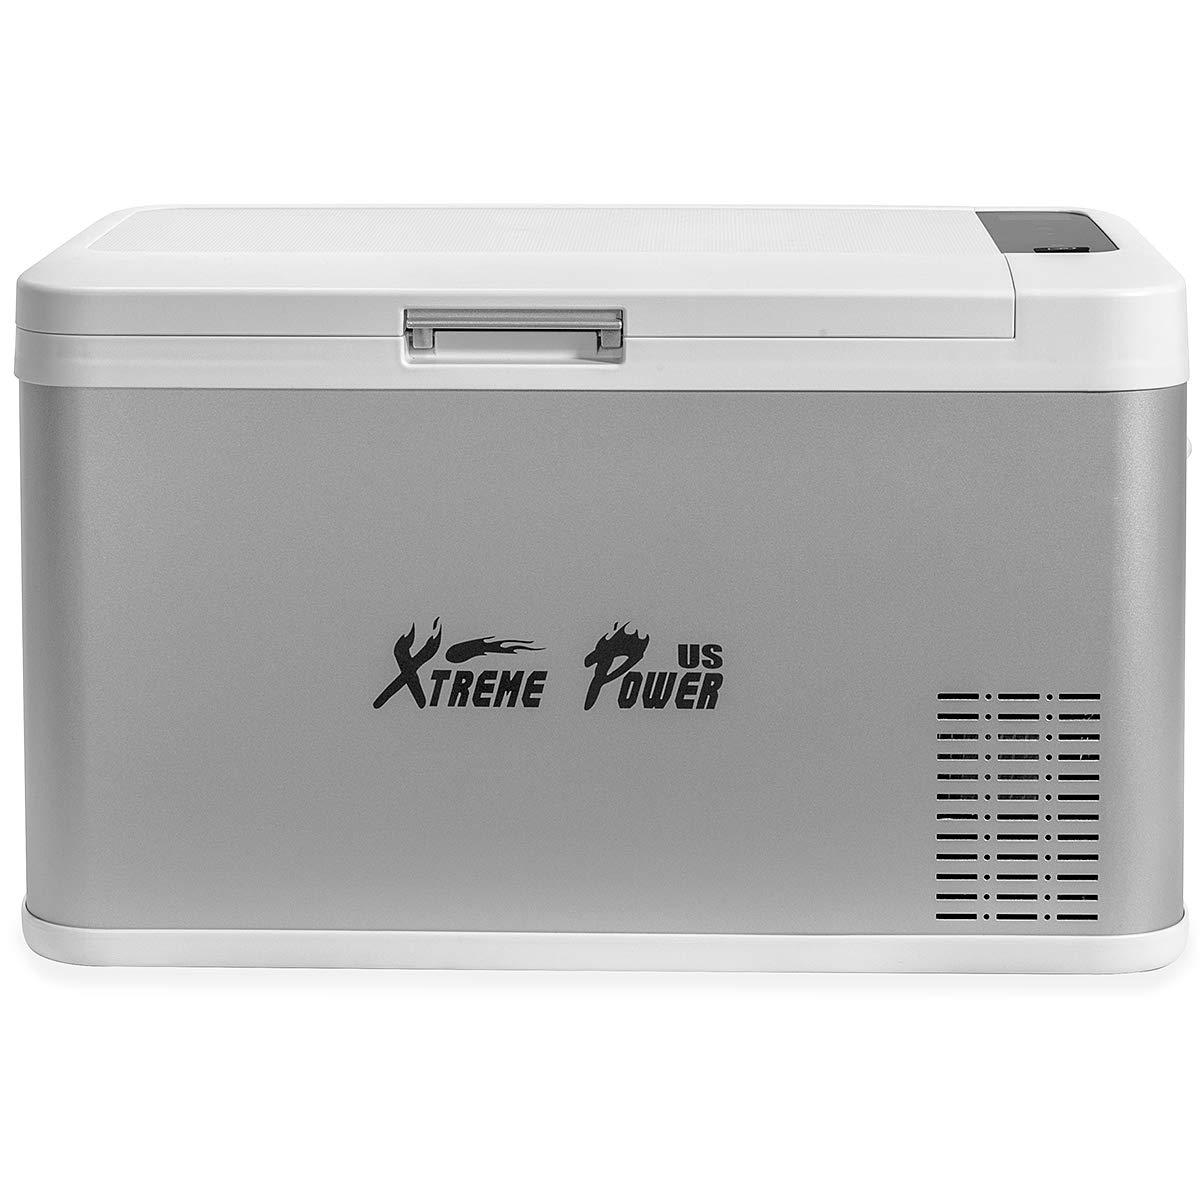 XtremepowerUS Portable Electric Cooler 26 Quart (Bluetooth Function) Refrigerator Adjustable Temperature Display Vehicle Car Mini Fridge ECO by XtremepowerUS (Image #2)